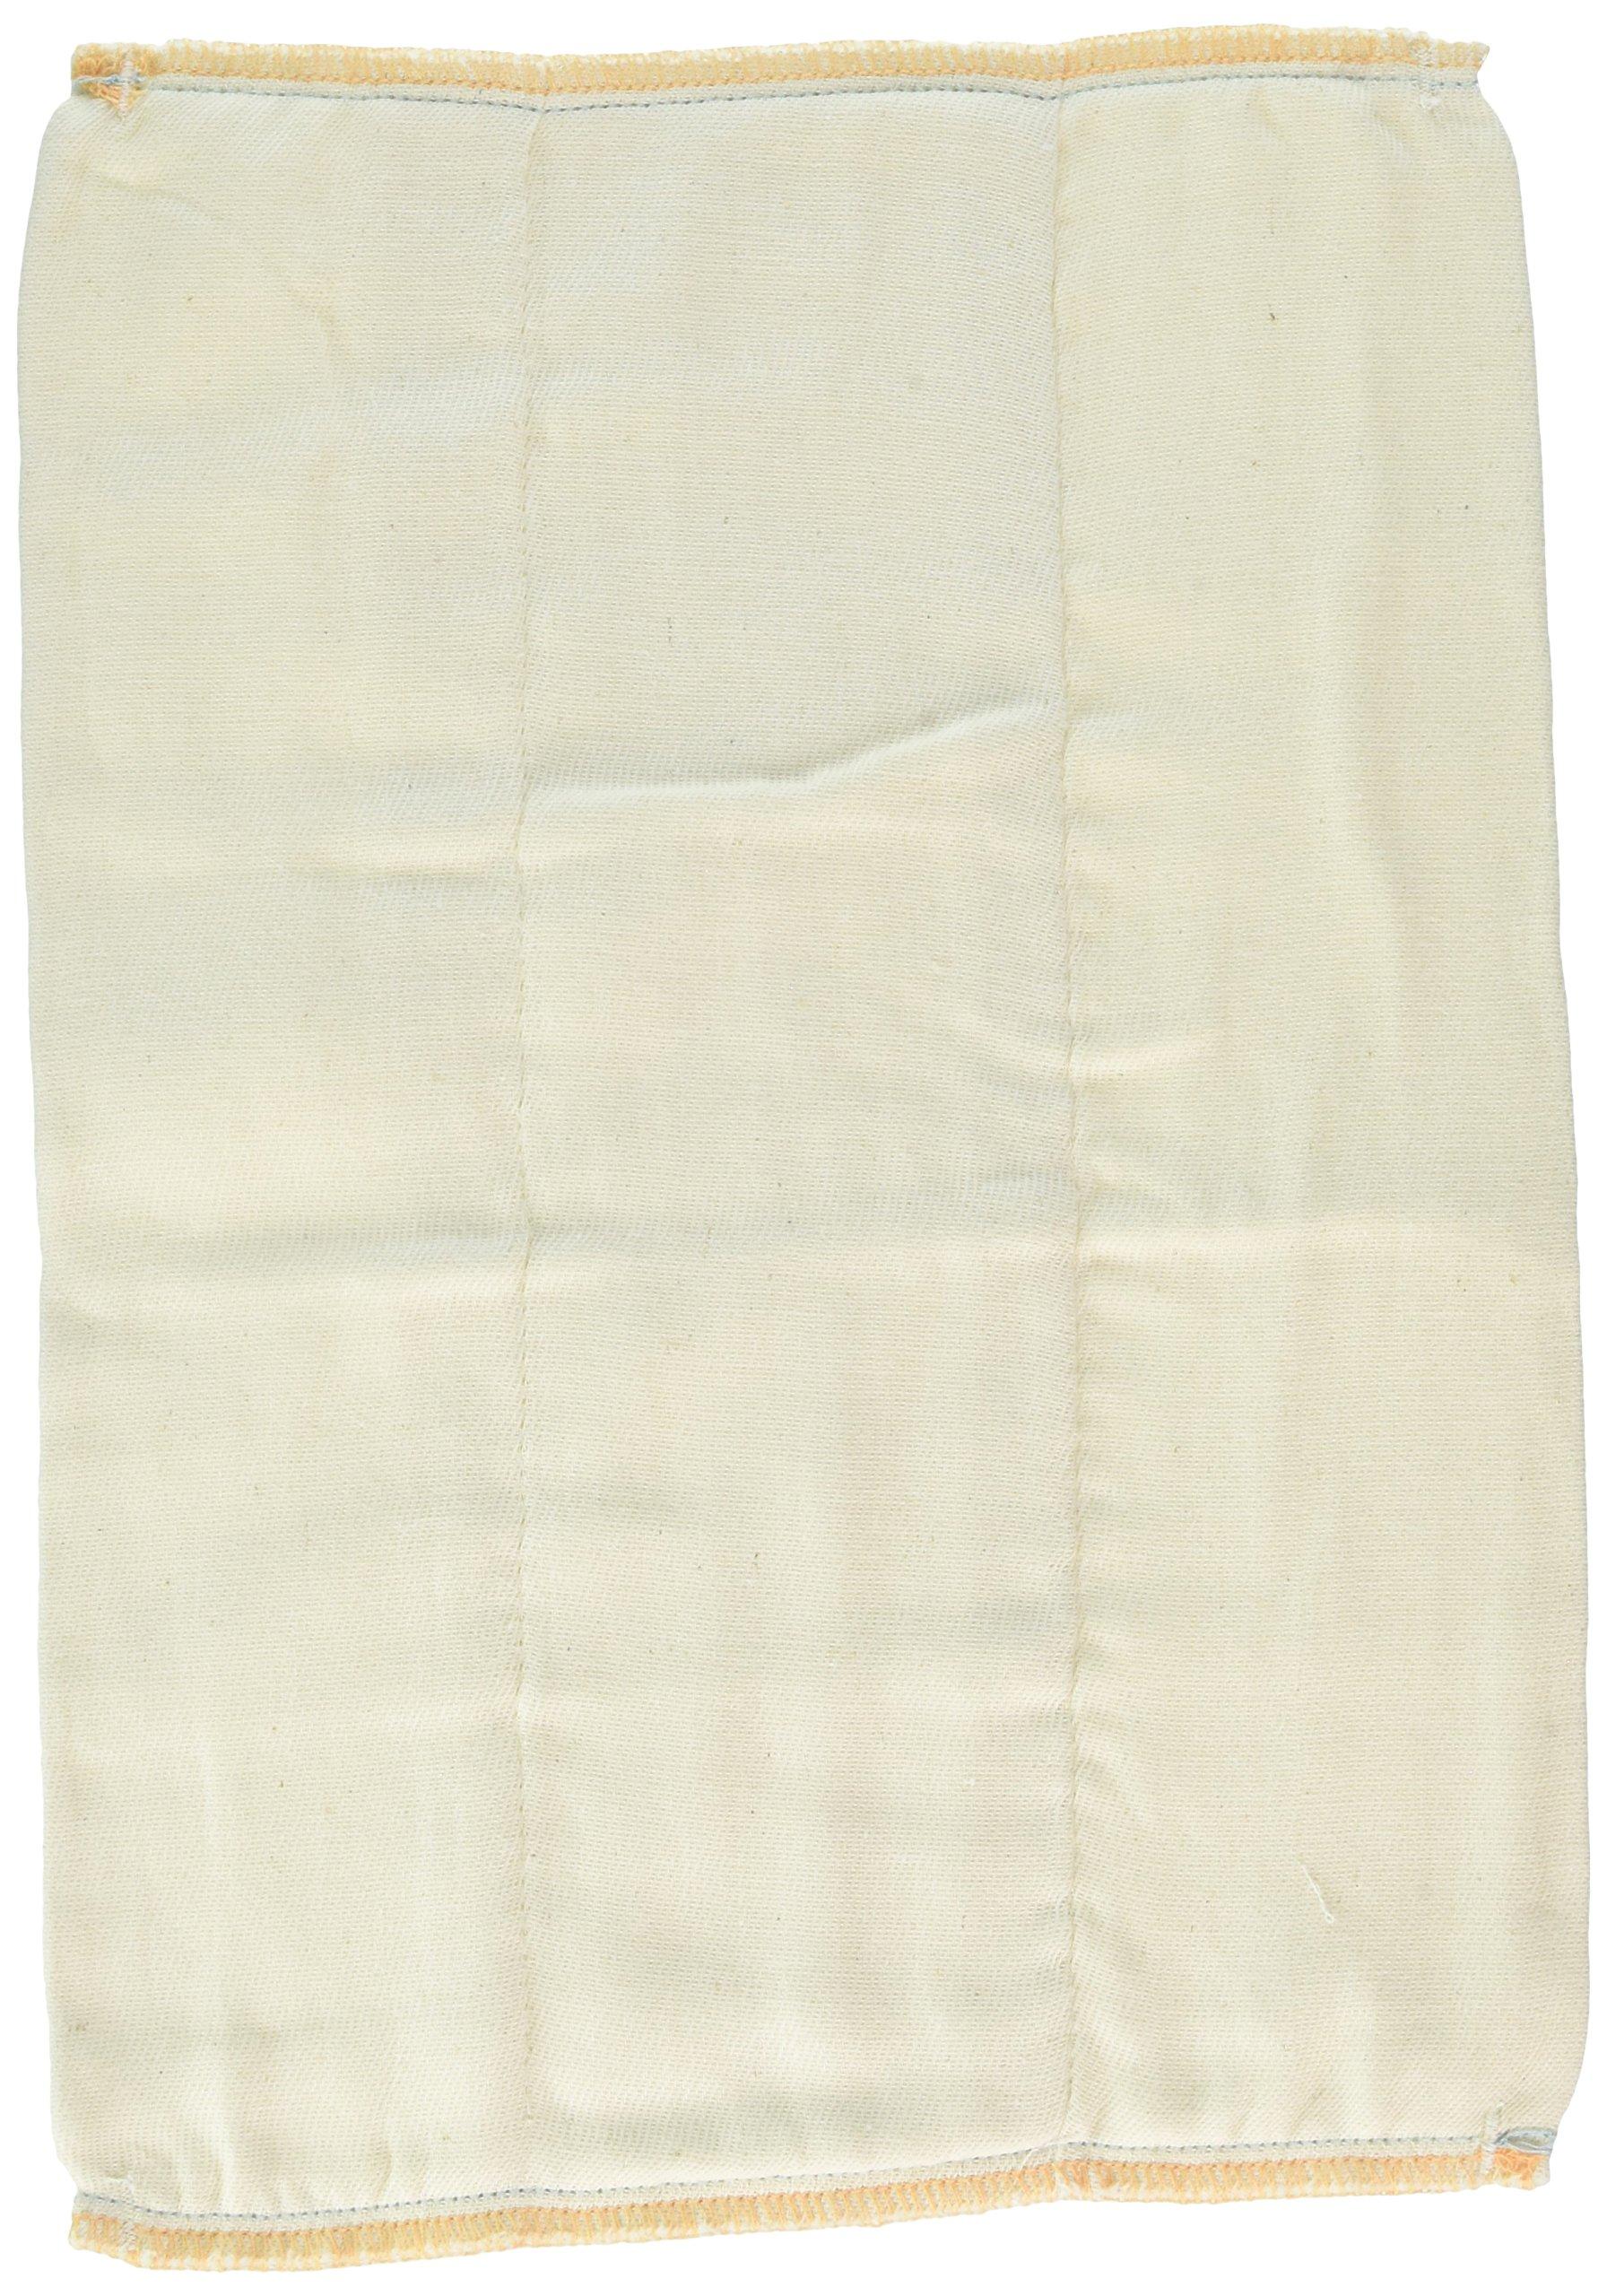 OsoCozy Unbleached Prefold Cloth Diapers – 12 Count, Newborn - 4x6x4 (6-11 lbs)